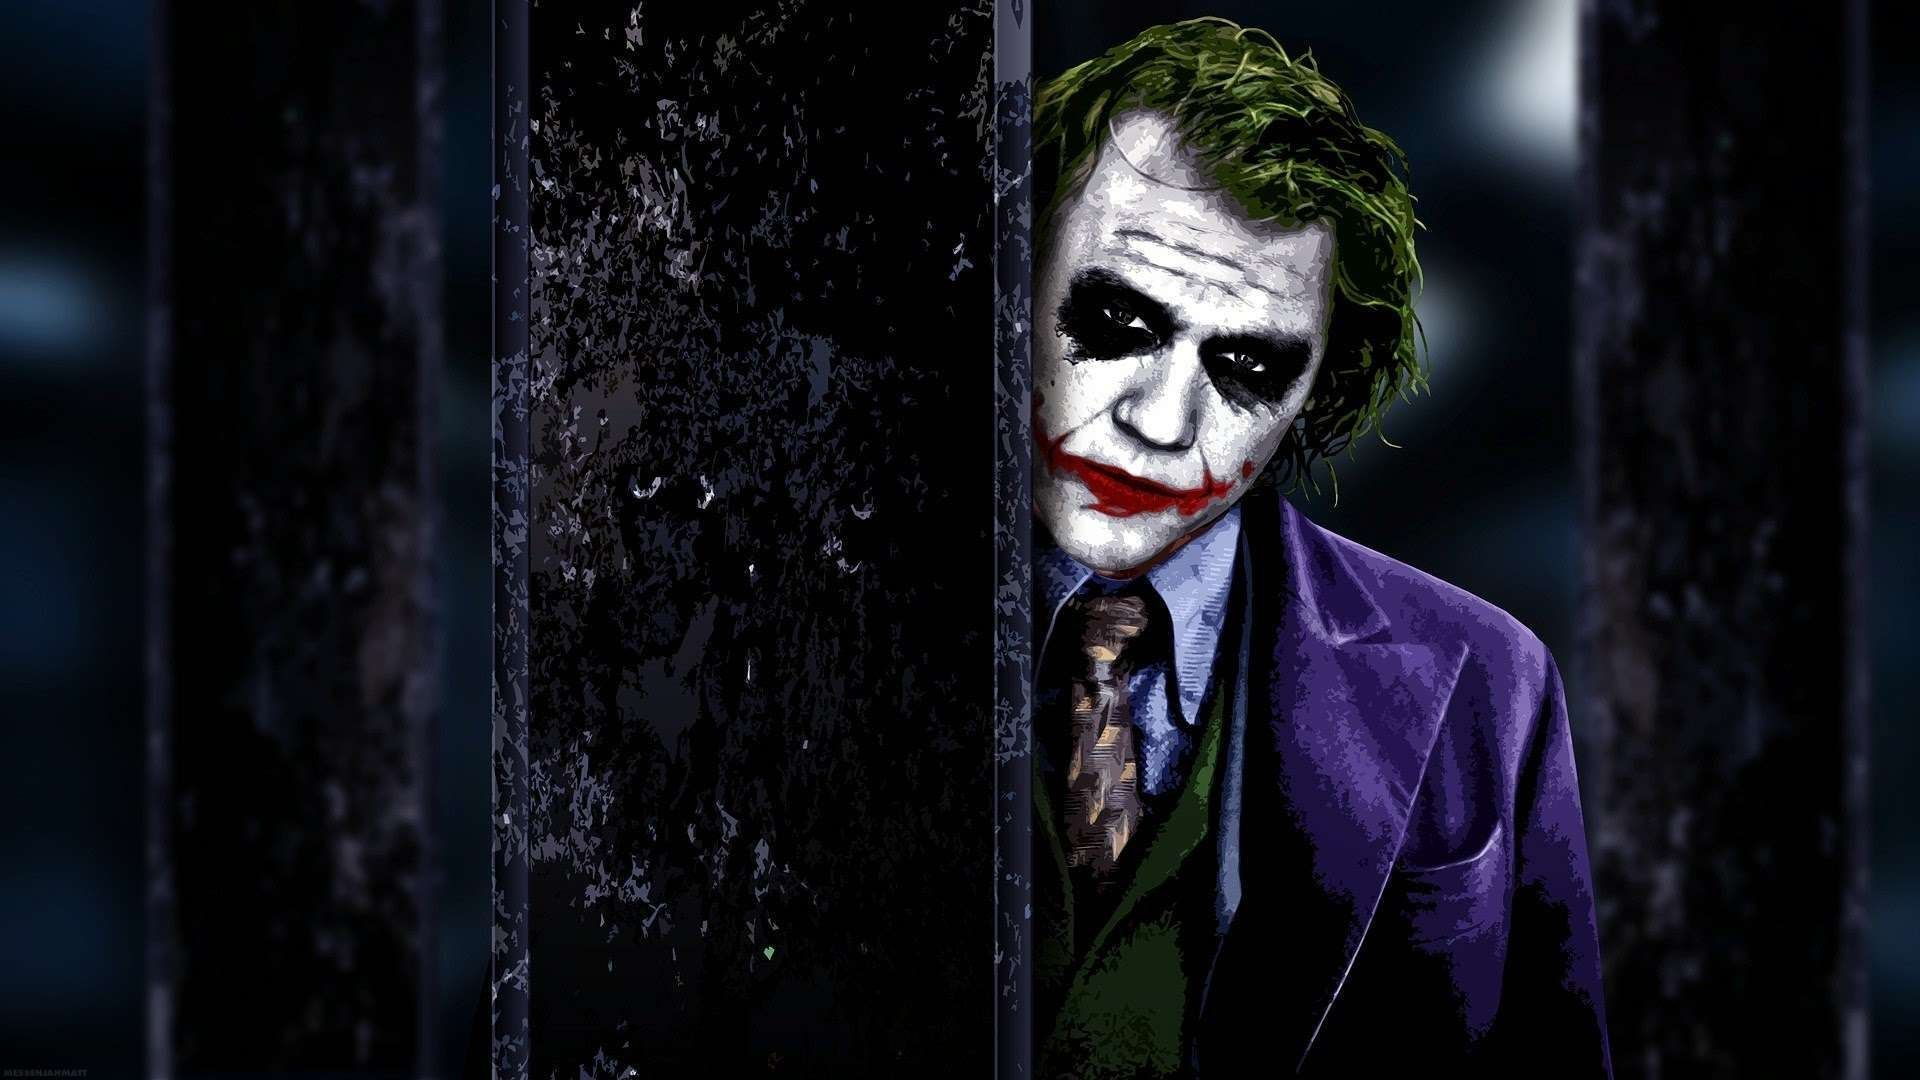 Joker Images And Pictures Joker Wallpapers Joker Images Batman Joker Wallpaper